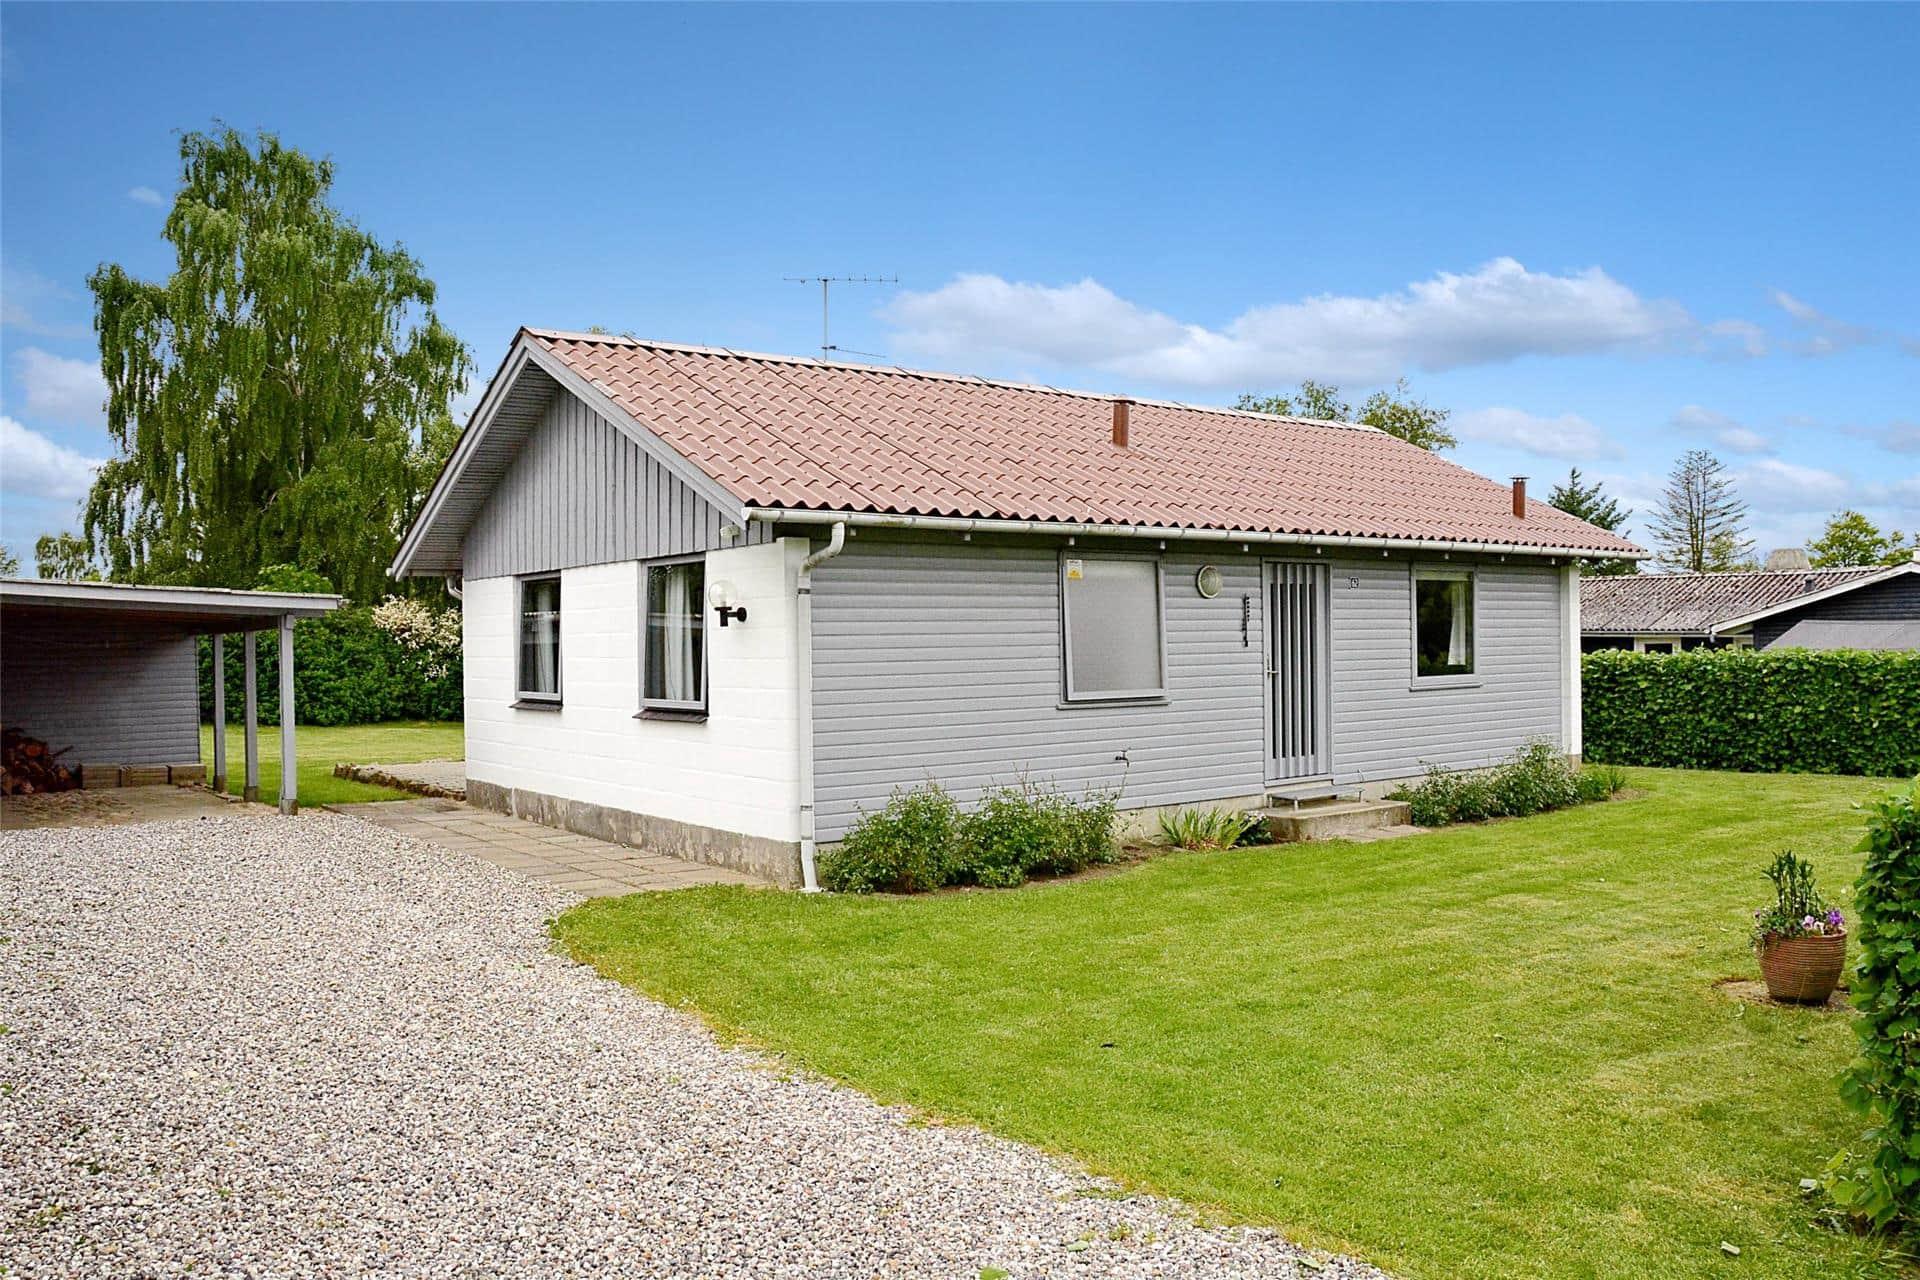 Billede 1-3 Sommerhus M64133, Vestermosen 62, DK - 5400 Bogense